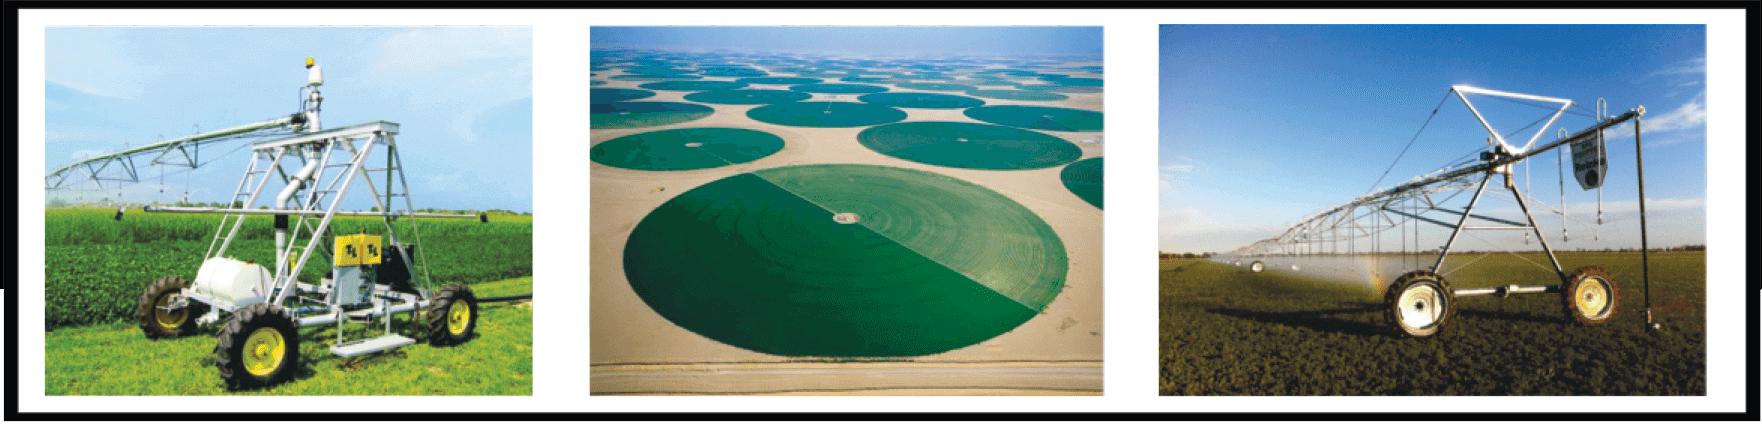 Agricultural irrigation - tarlasuvarma 0002 Layer 3 - Agricultural irrigation